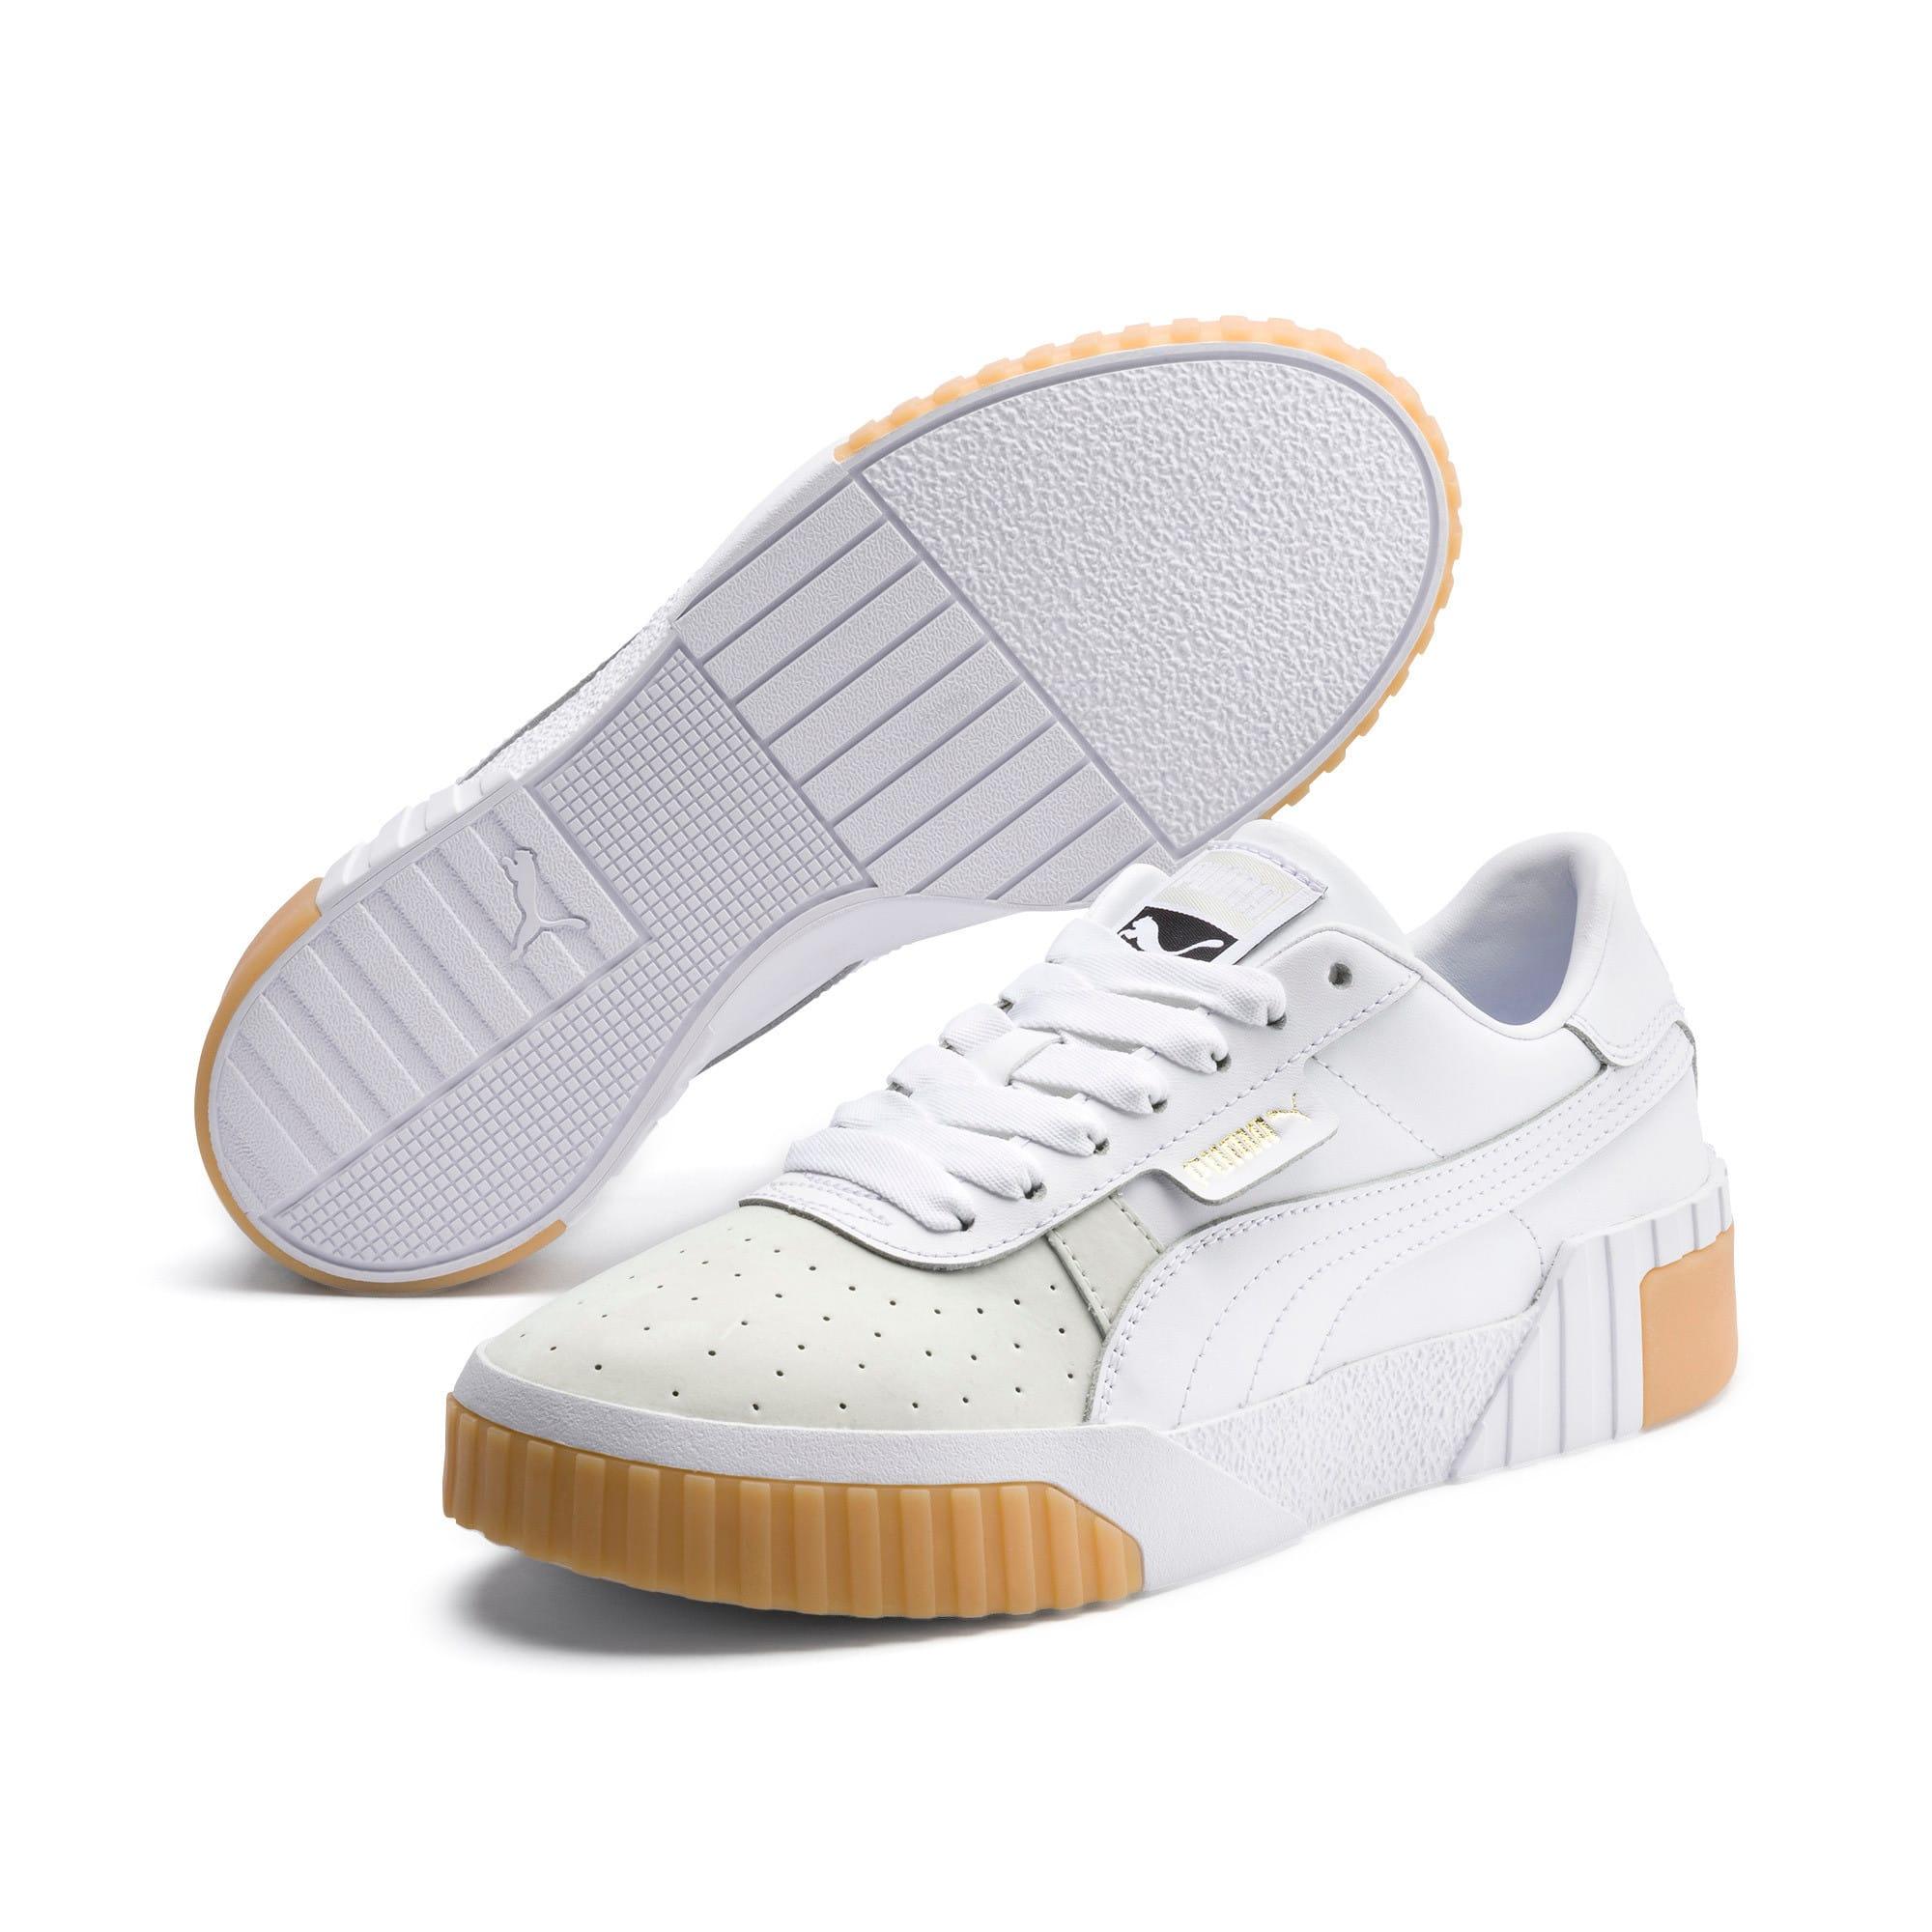 Thumbnail 2 of Cali Exotic Damen Sneaker, Puma White-Puma White, medium